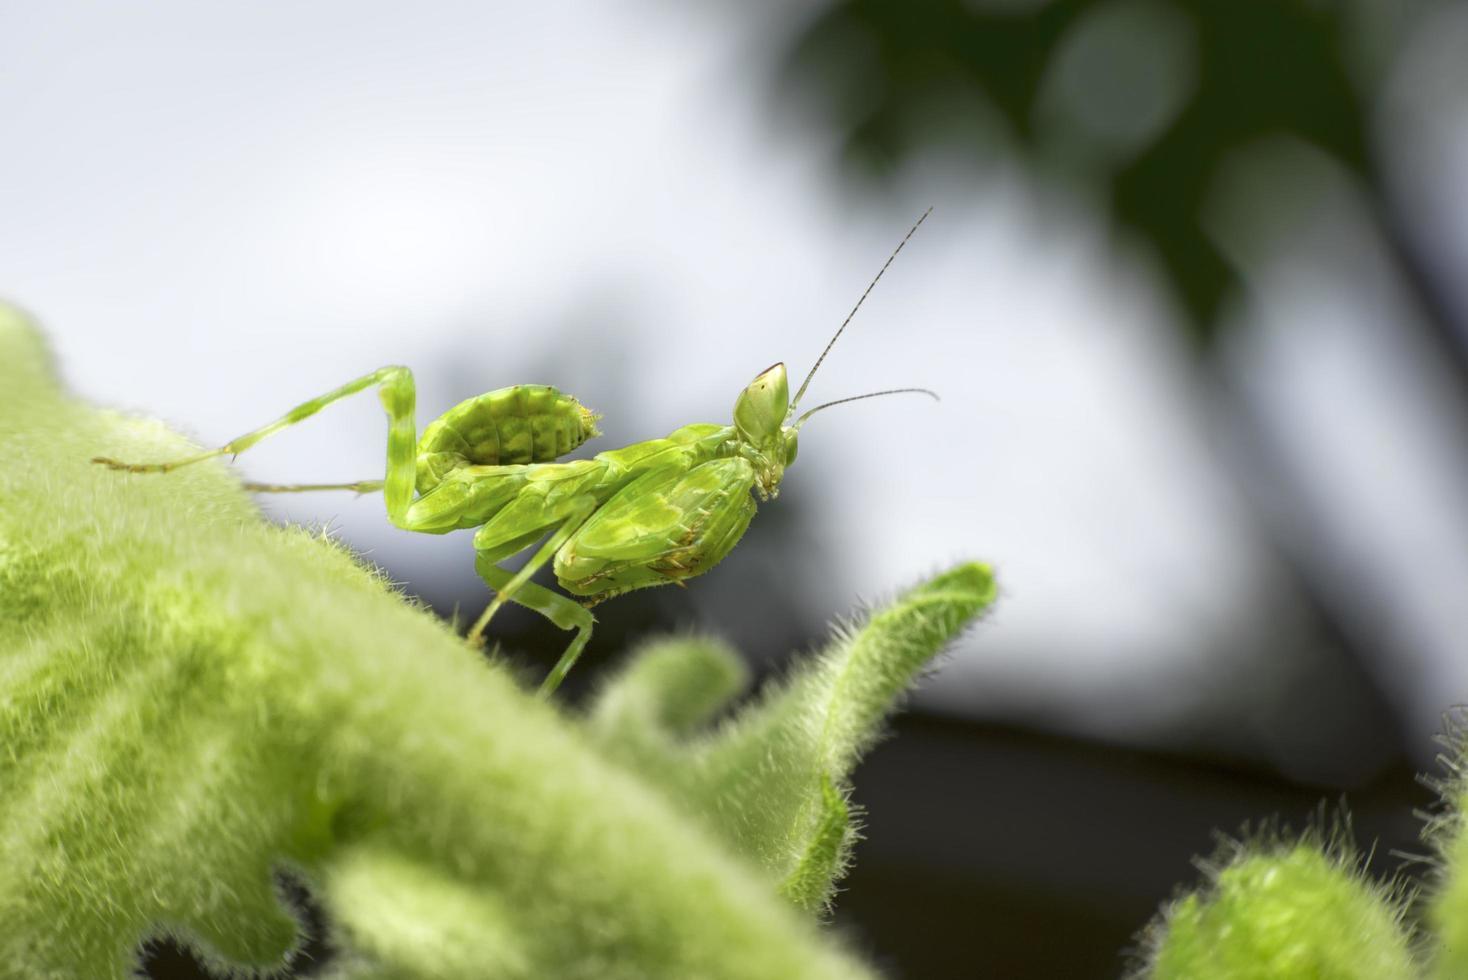 mante verte sur feuille verte photo